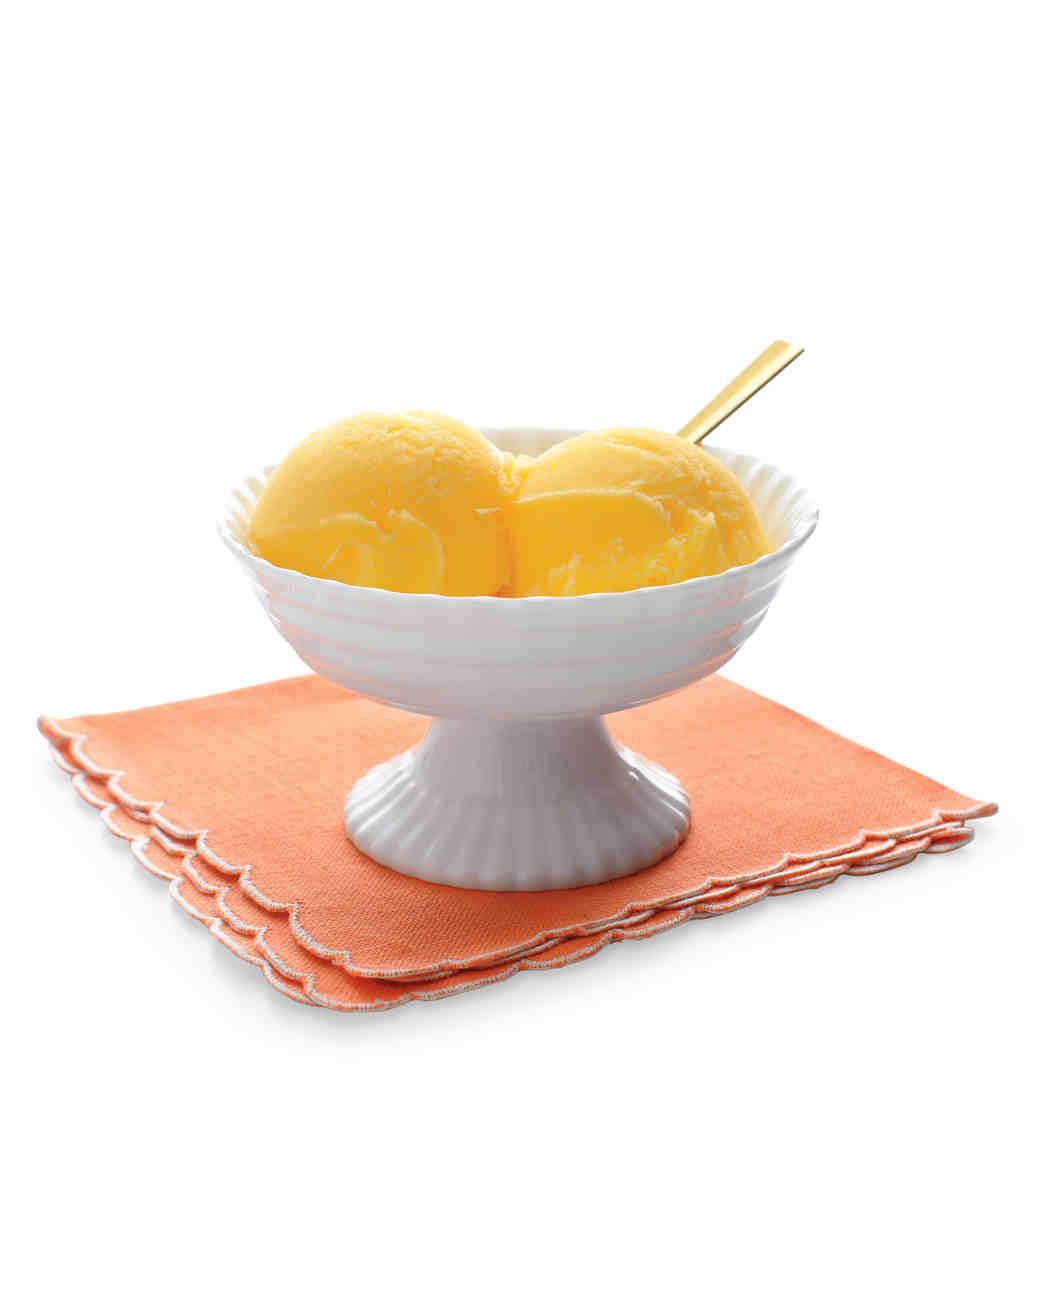 gelato-001-mwd109665.jpg